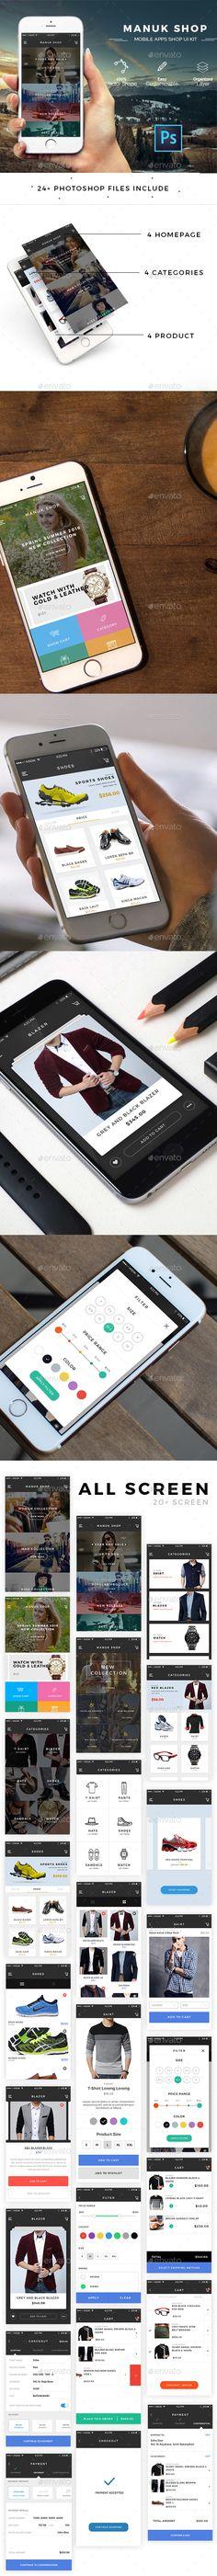 Manuk Shop - Mobile Apps UI Kit PSD. Download here: https://graphicriver.net/item/manuk-shop-mobile-apps-ui-kit/16162403?ref=ksioks